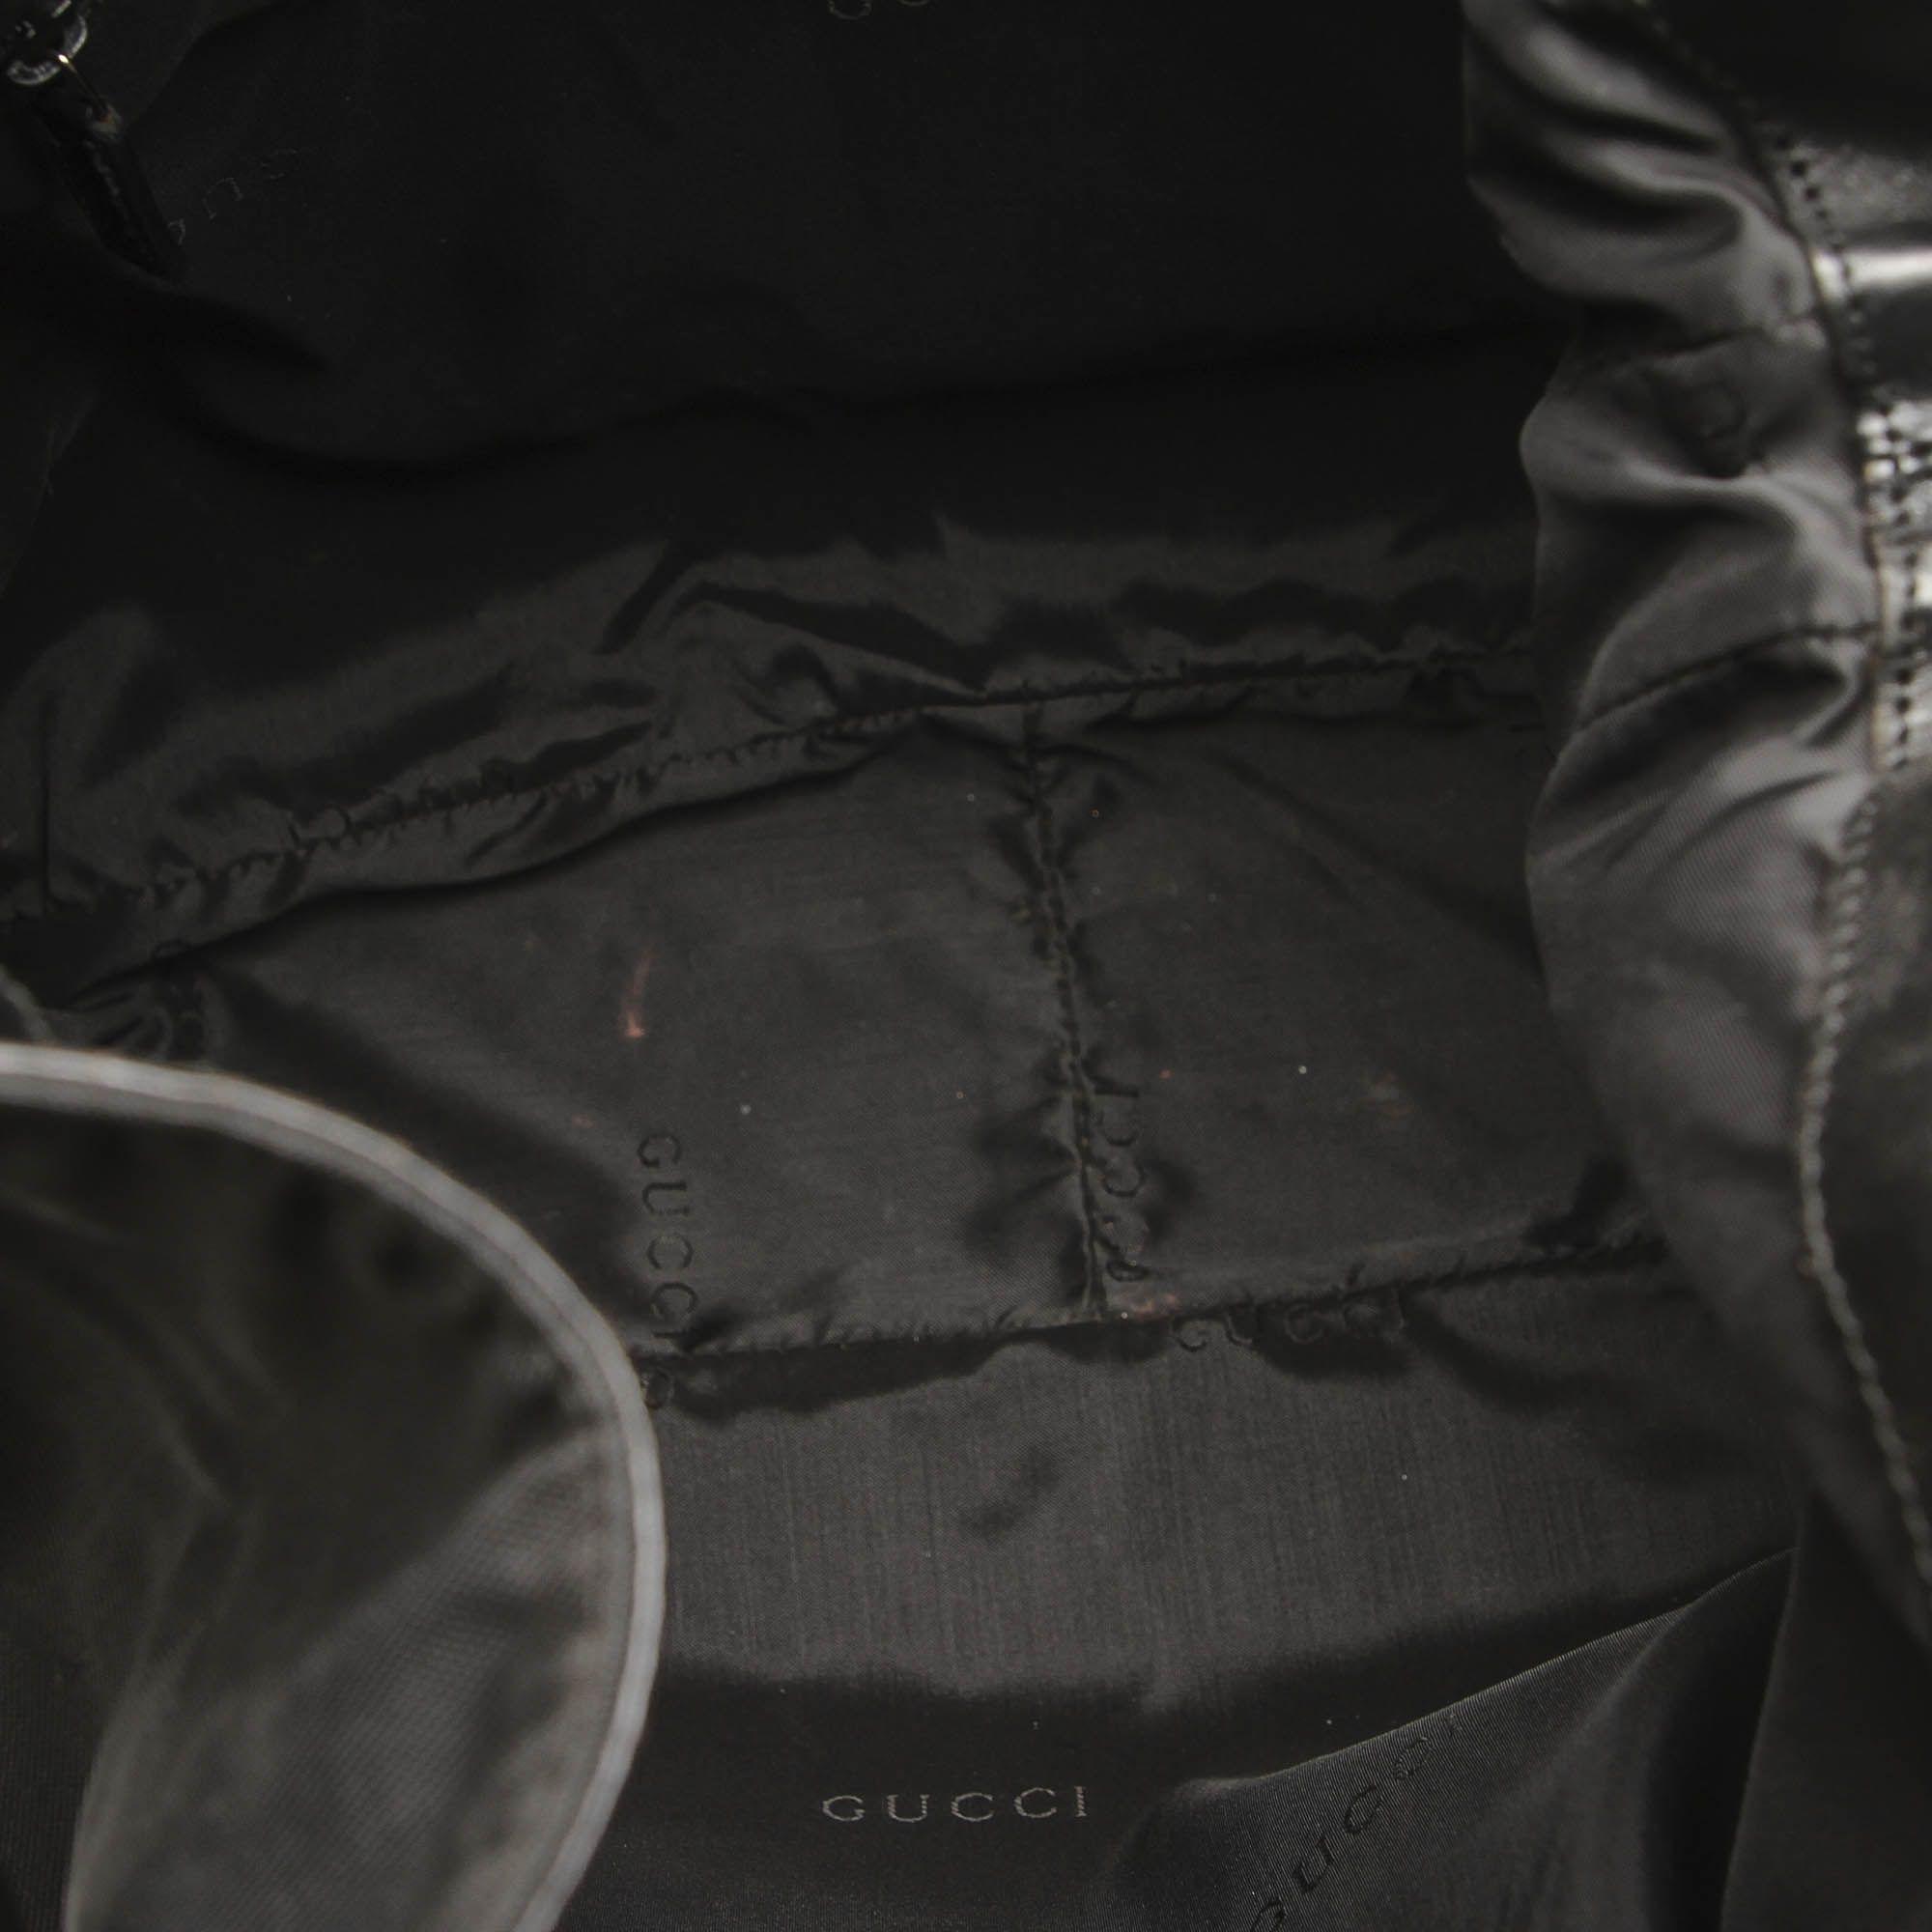 Vintage Gucci Bamboo Nylon Satchel Black